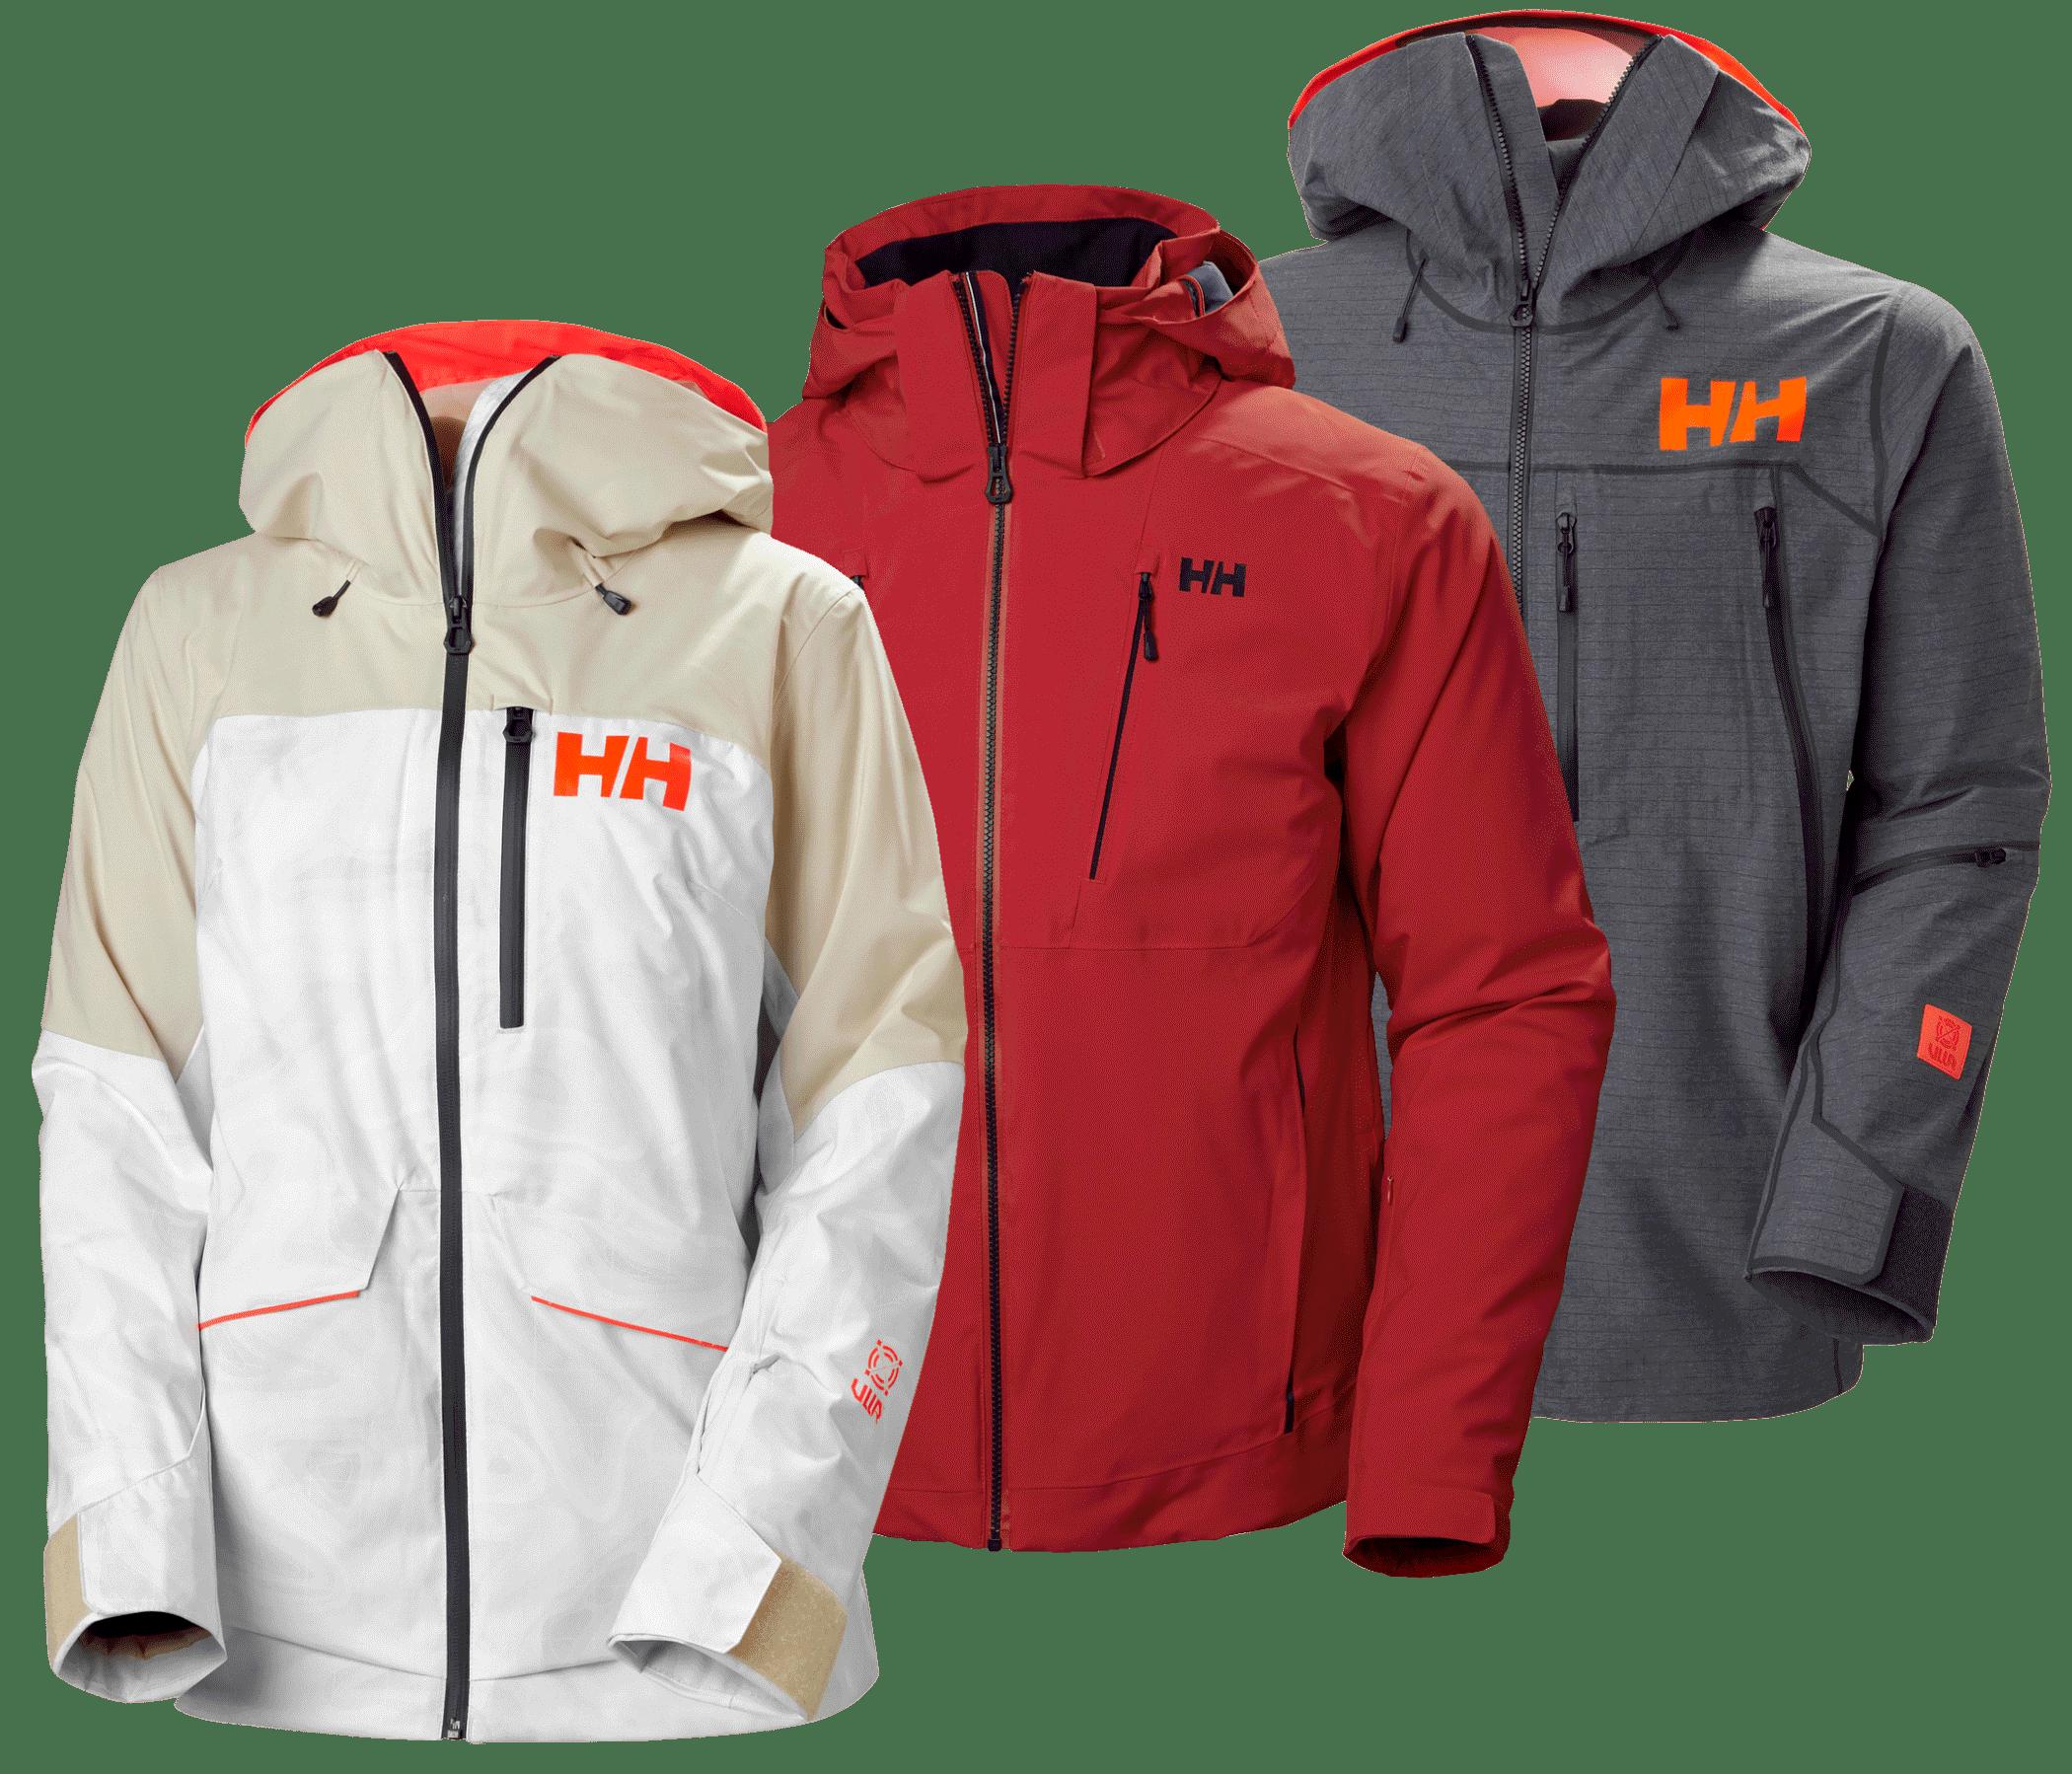 Clothing, Outerwear, Coat, Neck, Sleeve, Collar, Font, Jacket